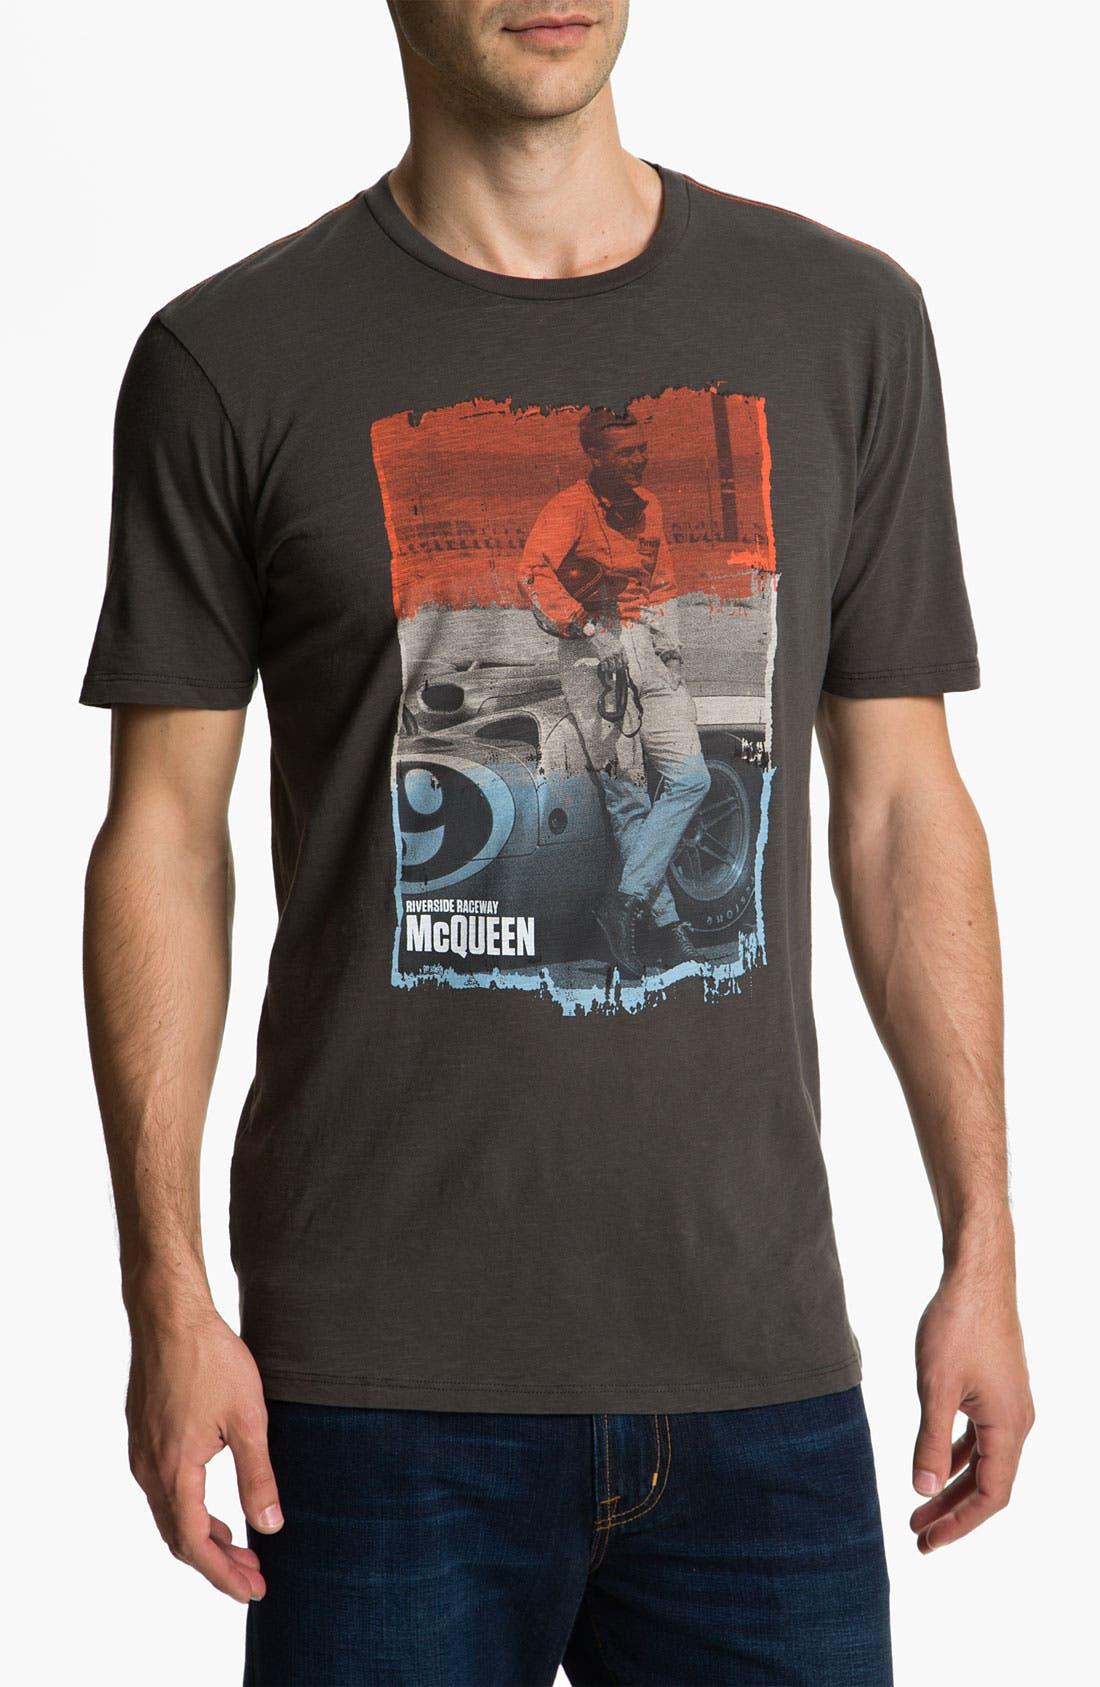 Alternate Image 1 Selected - Troy Lee Designs 'R.I.R.' T-Shirt